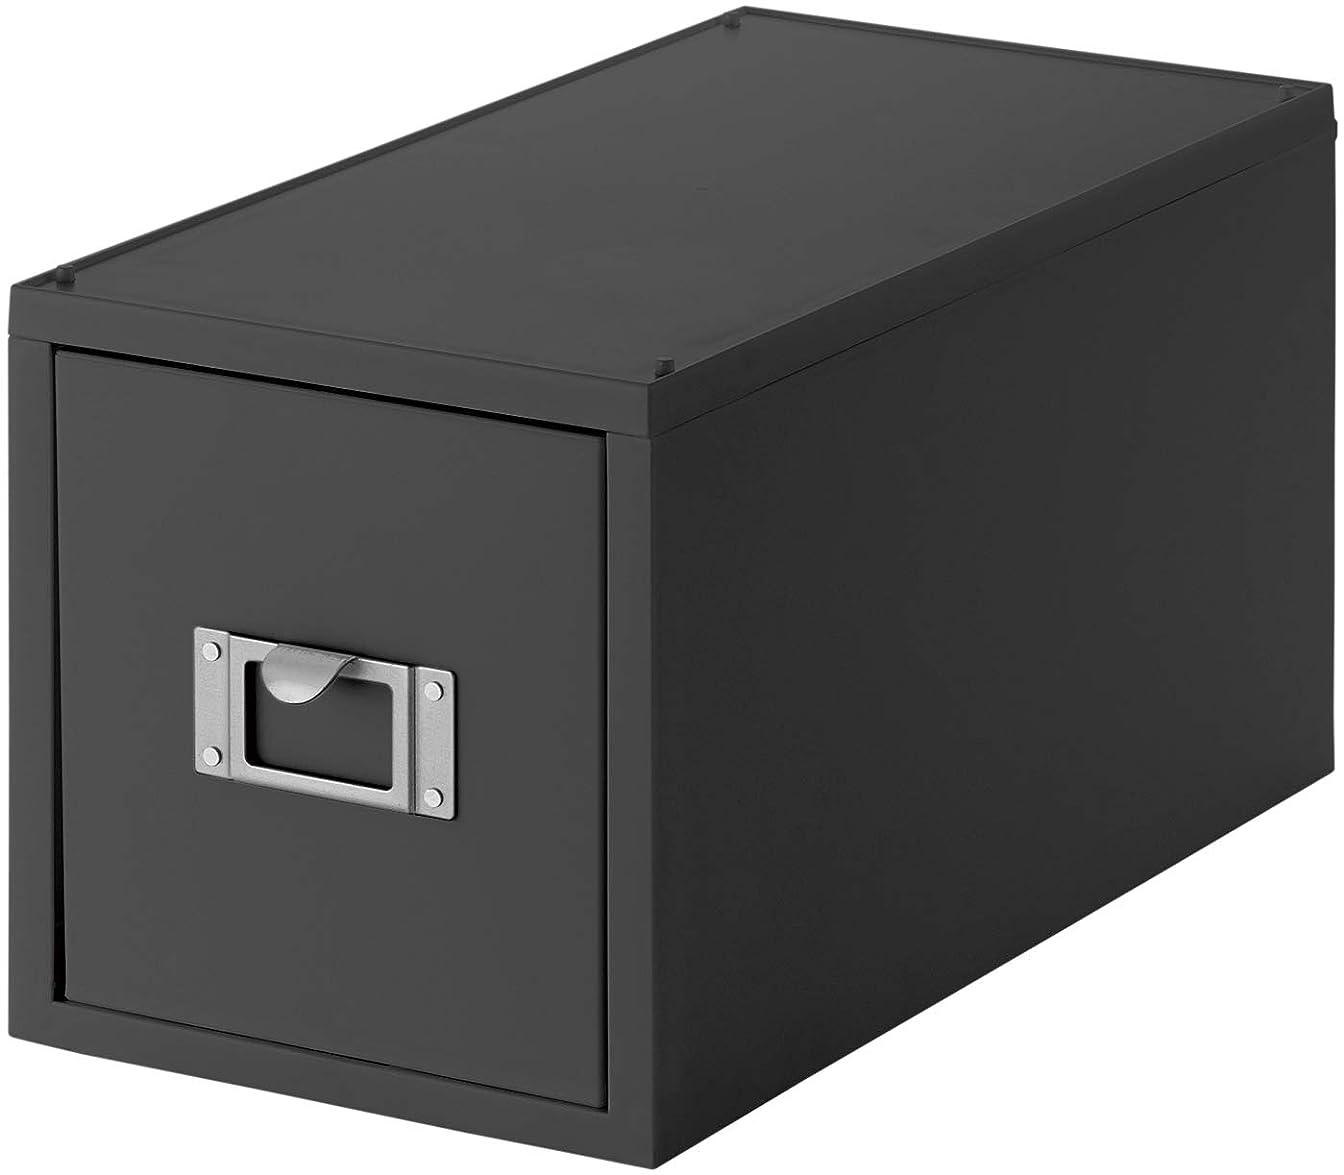 like-it 収納ケース グレー 約幅17.3×奥行35×高さ18.2cm CDファイルユニット Life Module LM-30